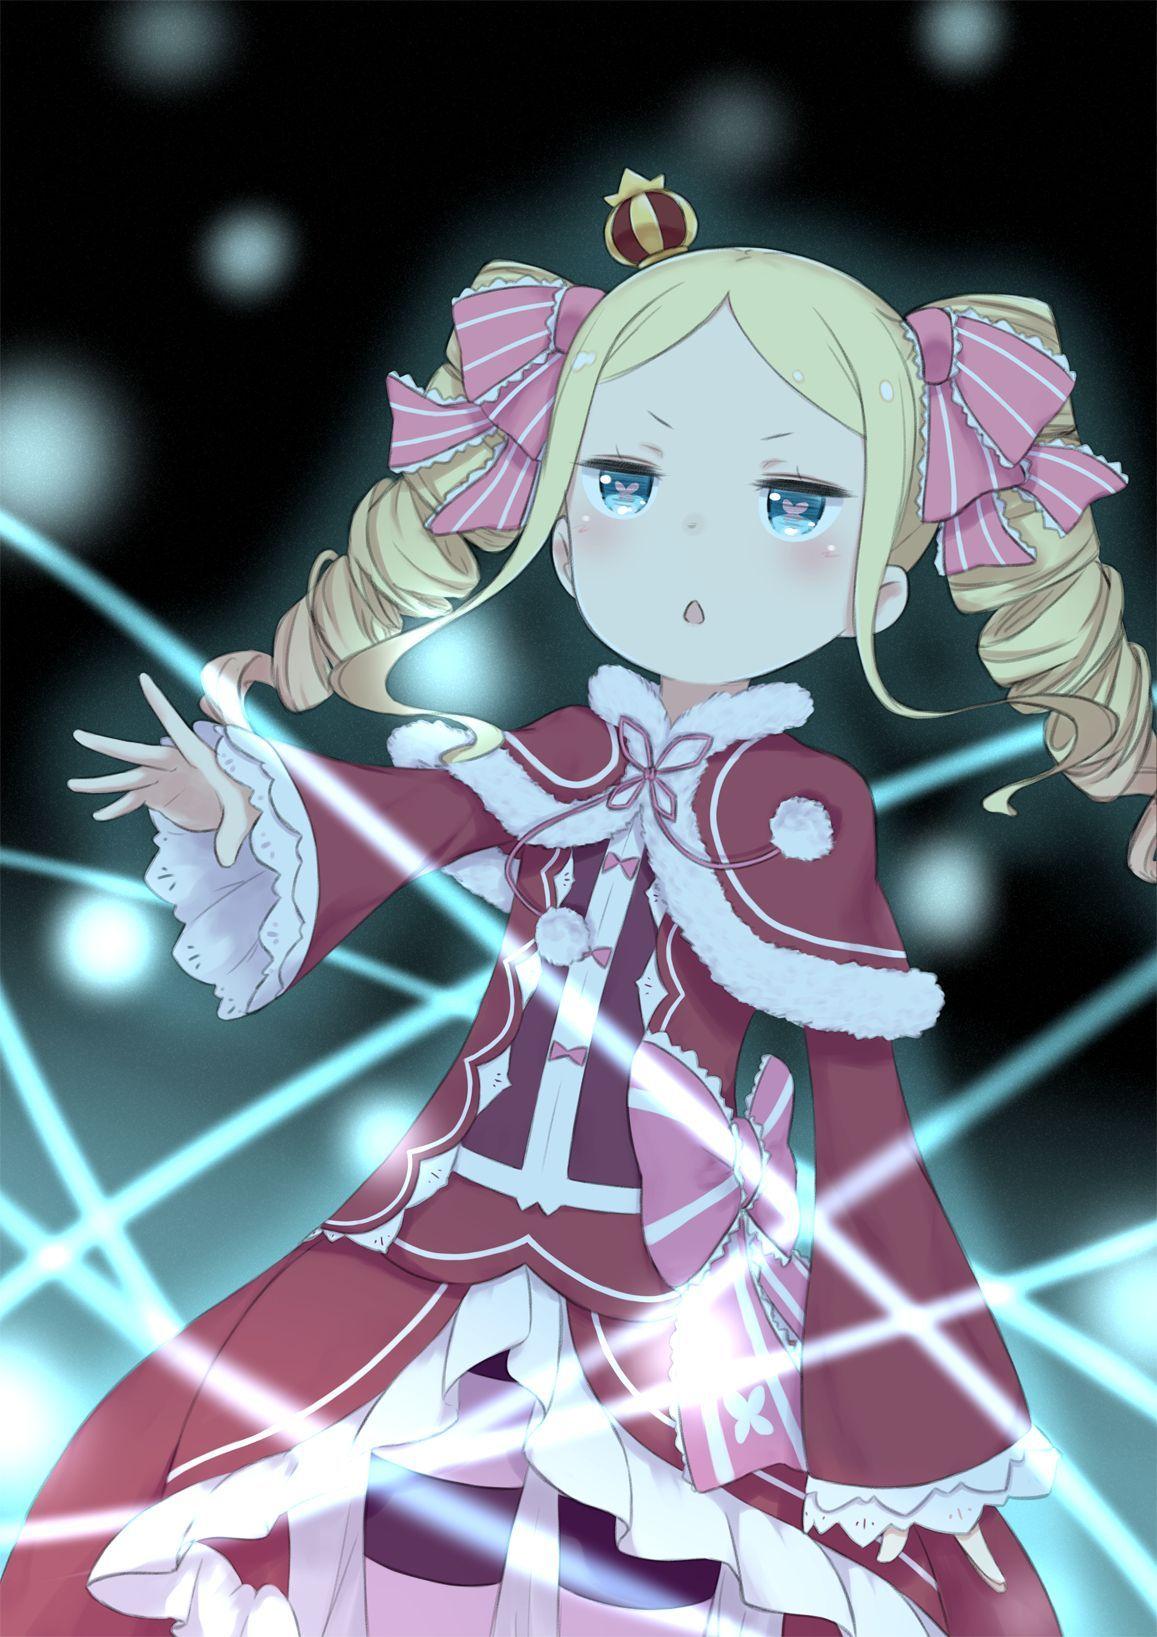 Wallpaper Anime Re Zero em 2020 Re zero, Anime, Manga